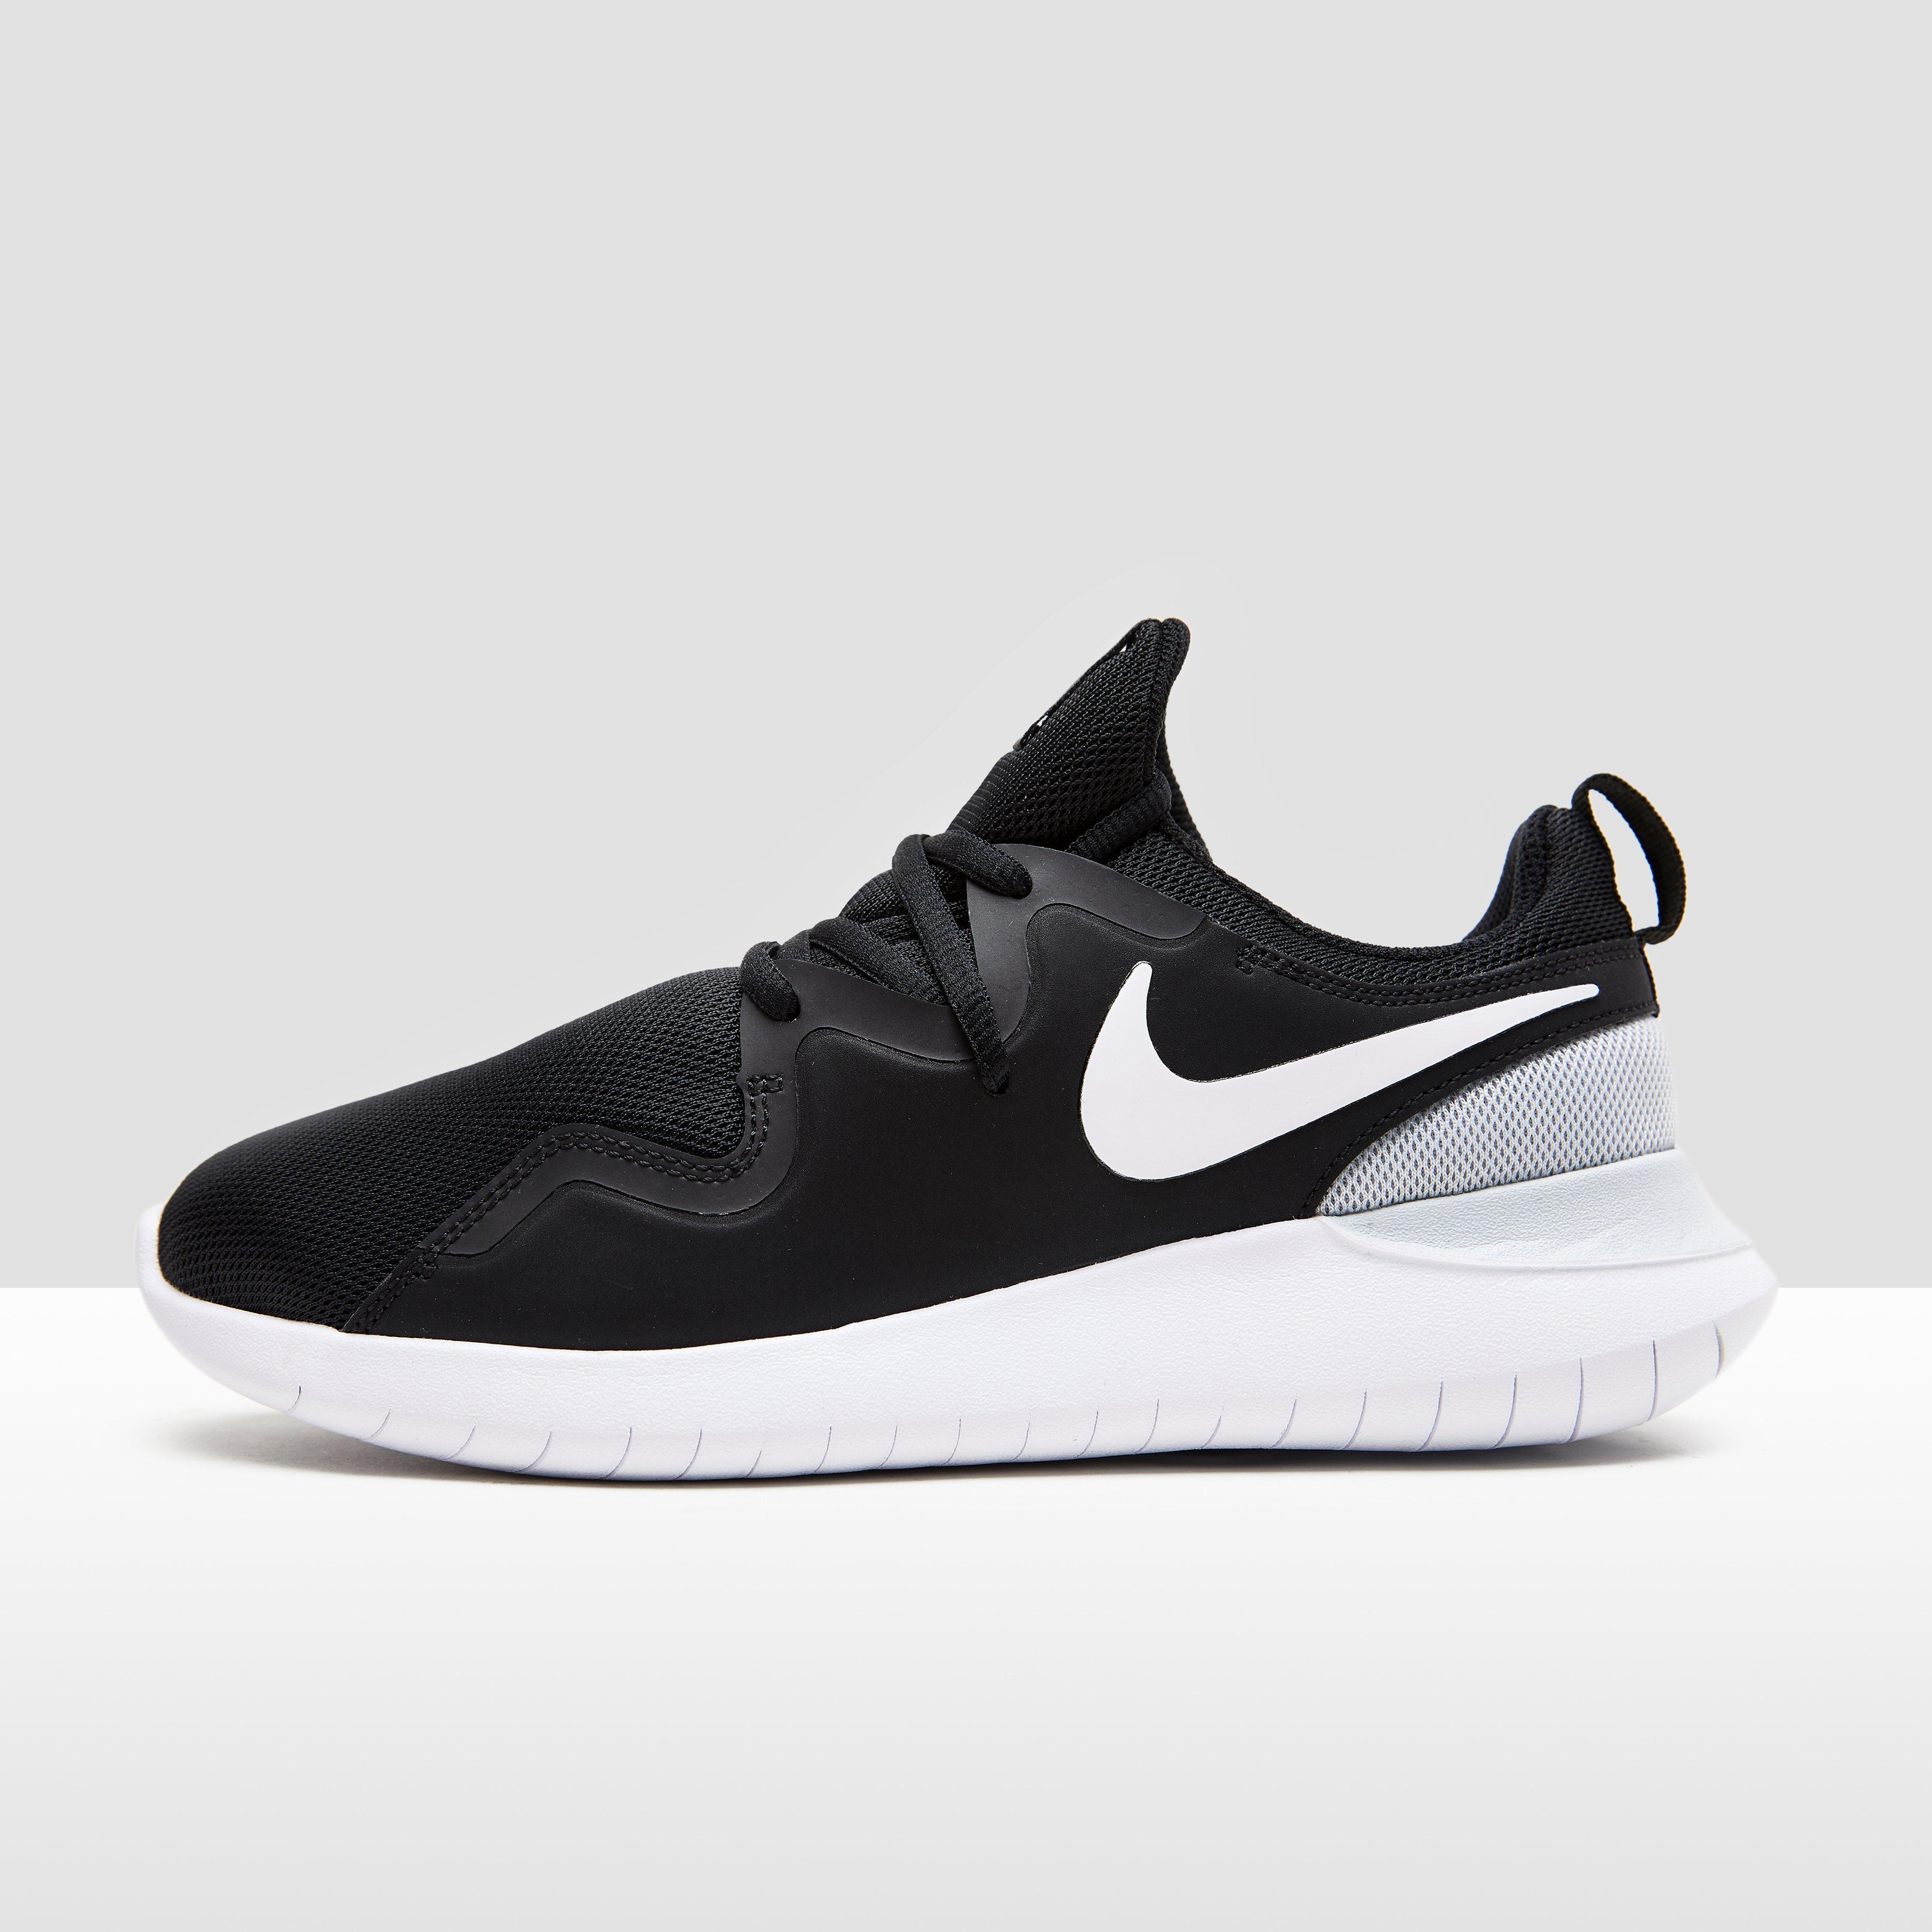 Nike Sneakers Femme Tessen oKHLj